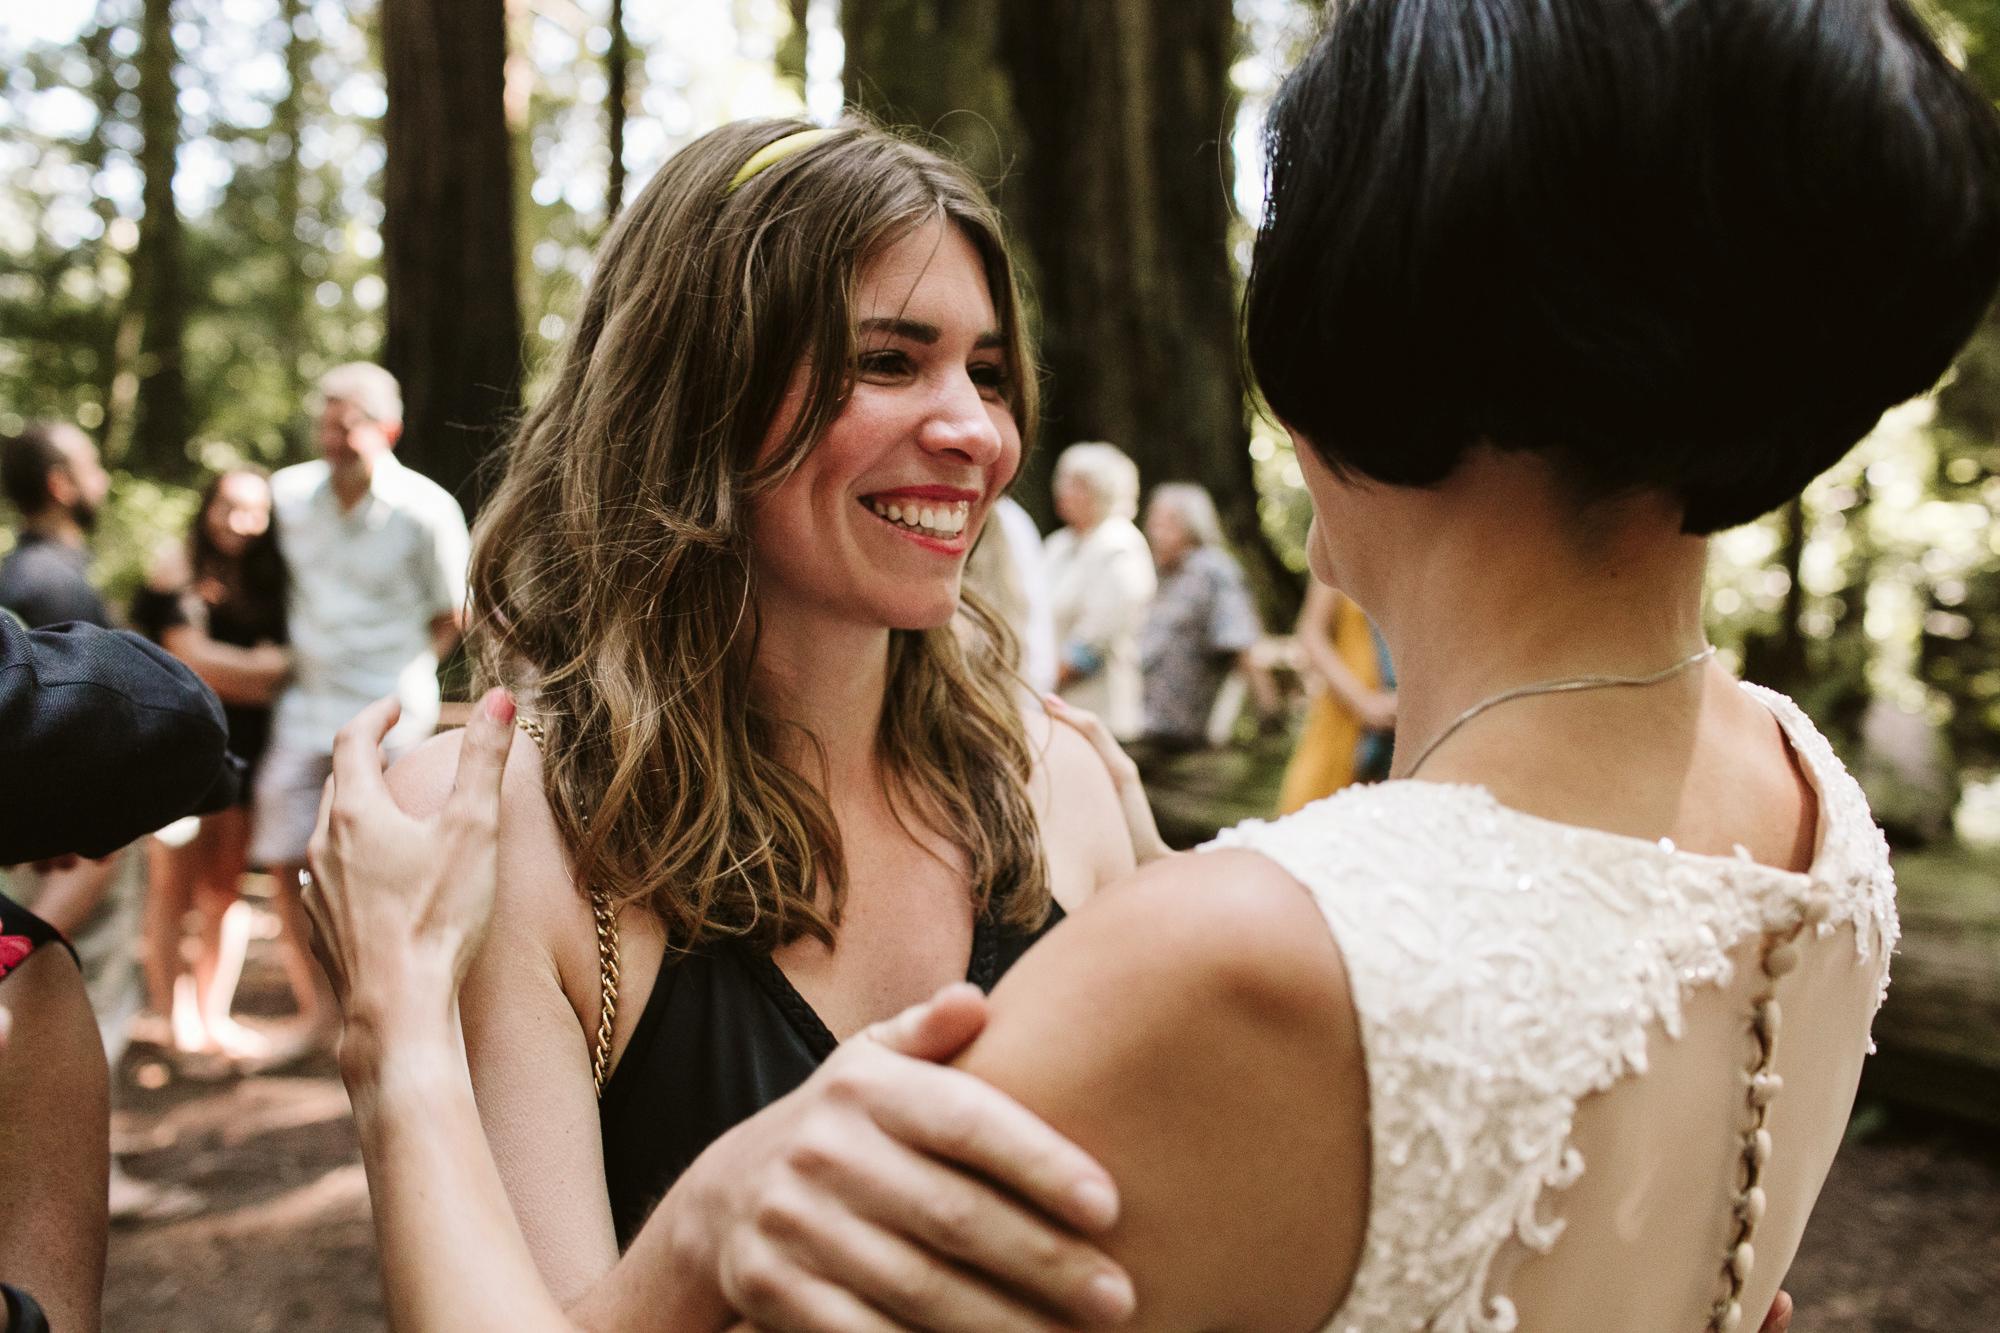 California-wedding-photographer-alfonso-flores-pamplin-groove-220.jpg